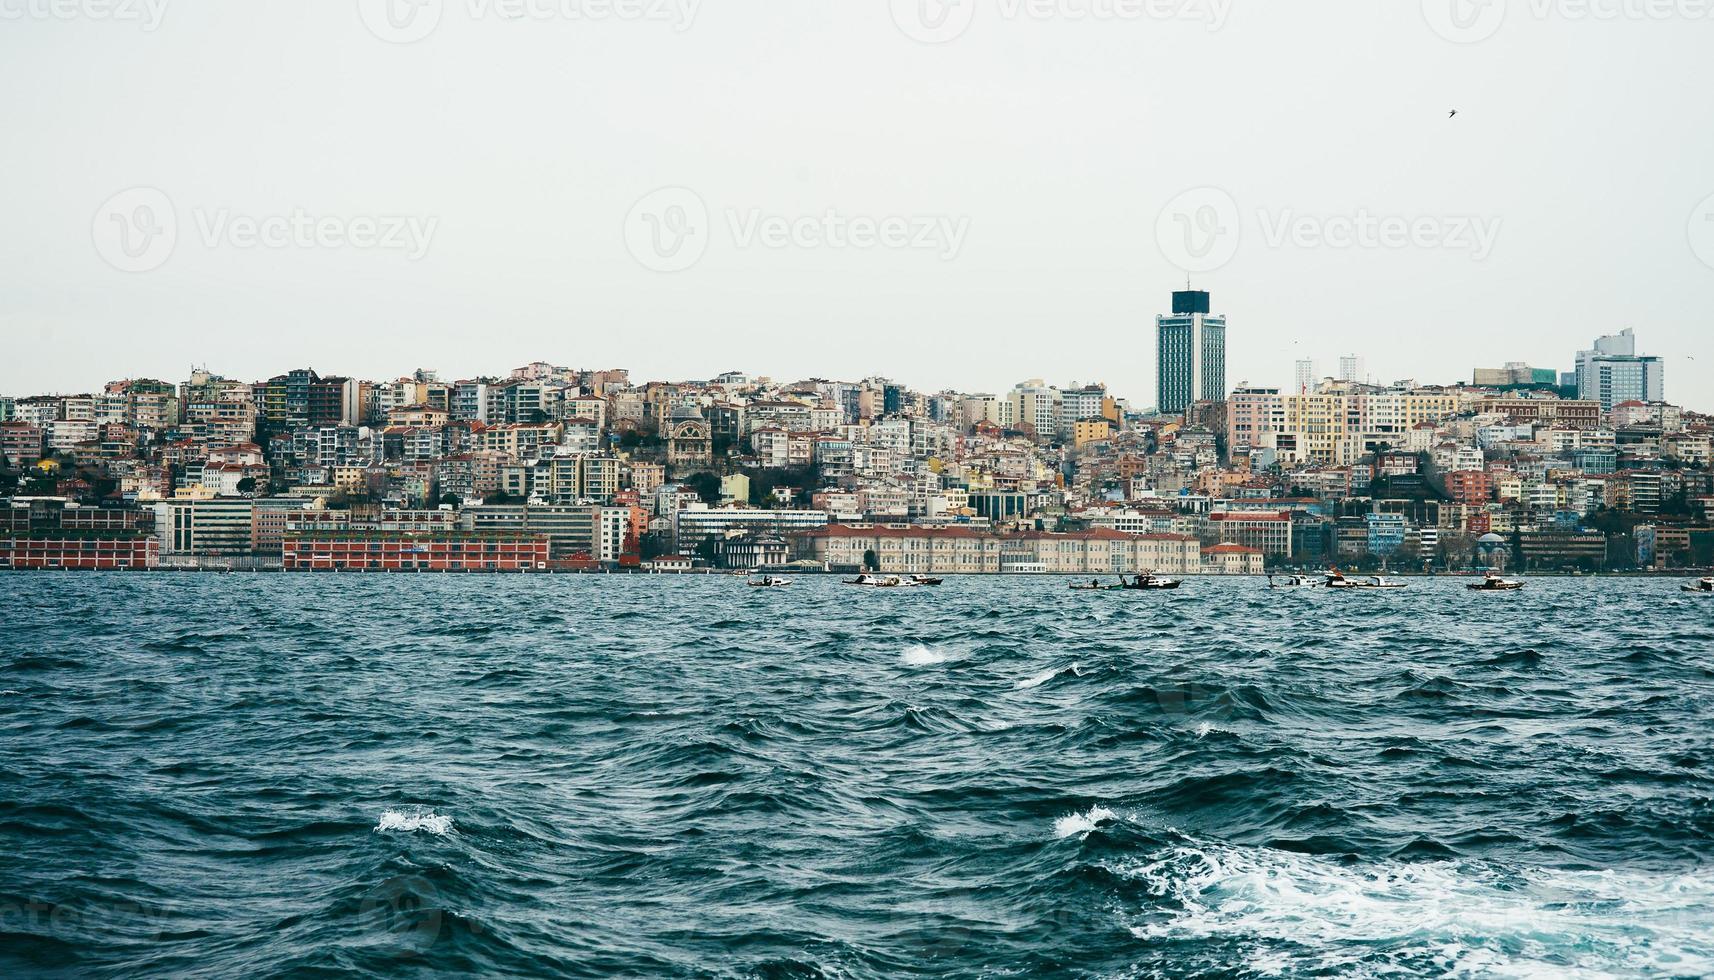 Istanbul view, Босфорский пролив photo